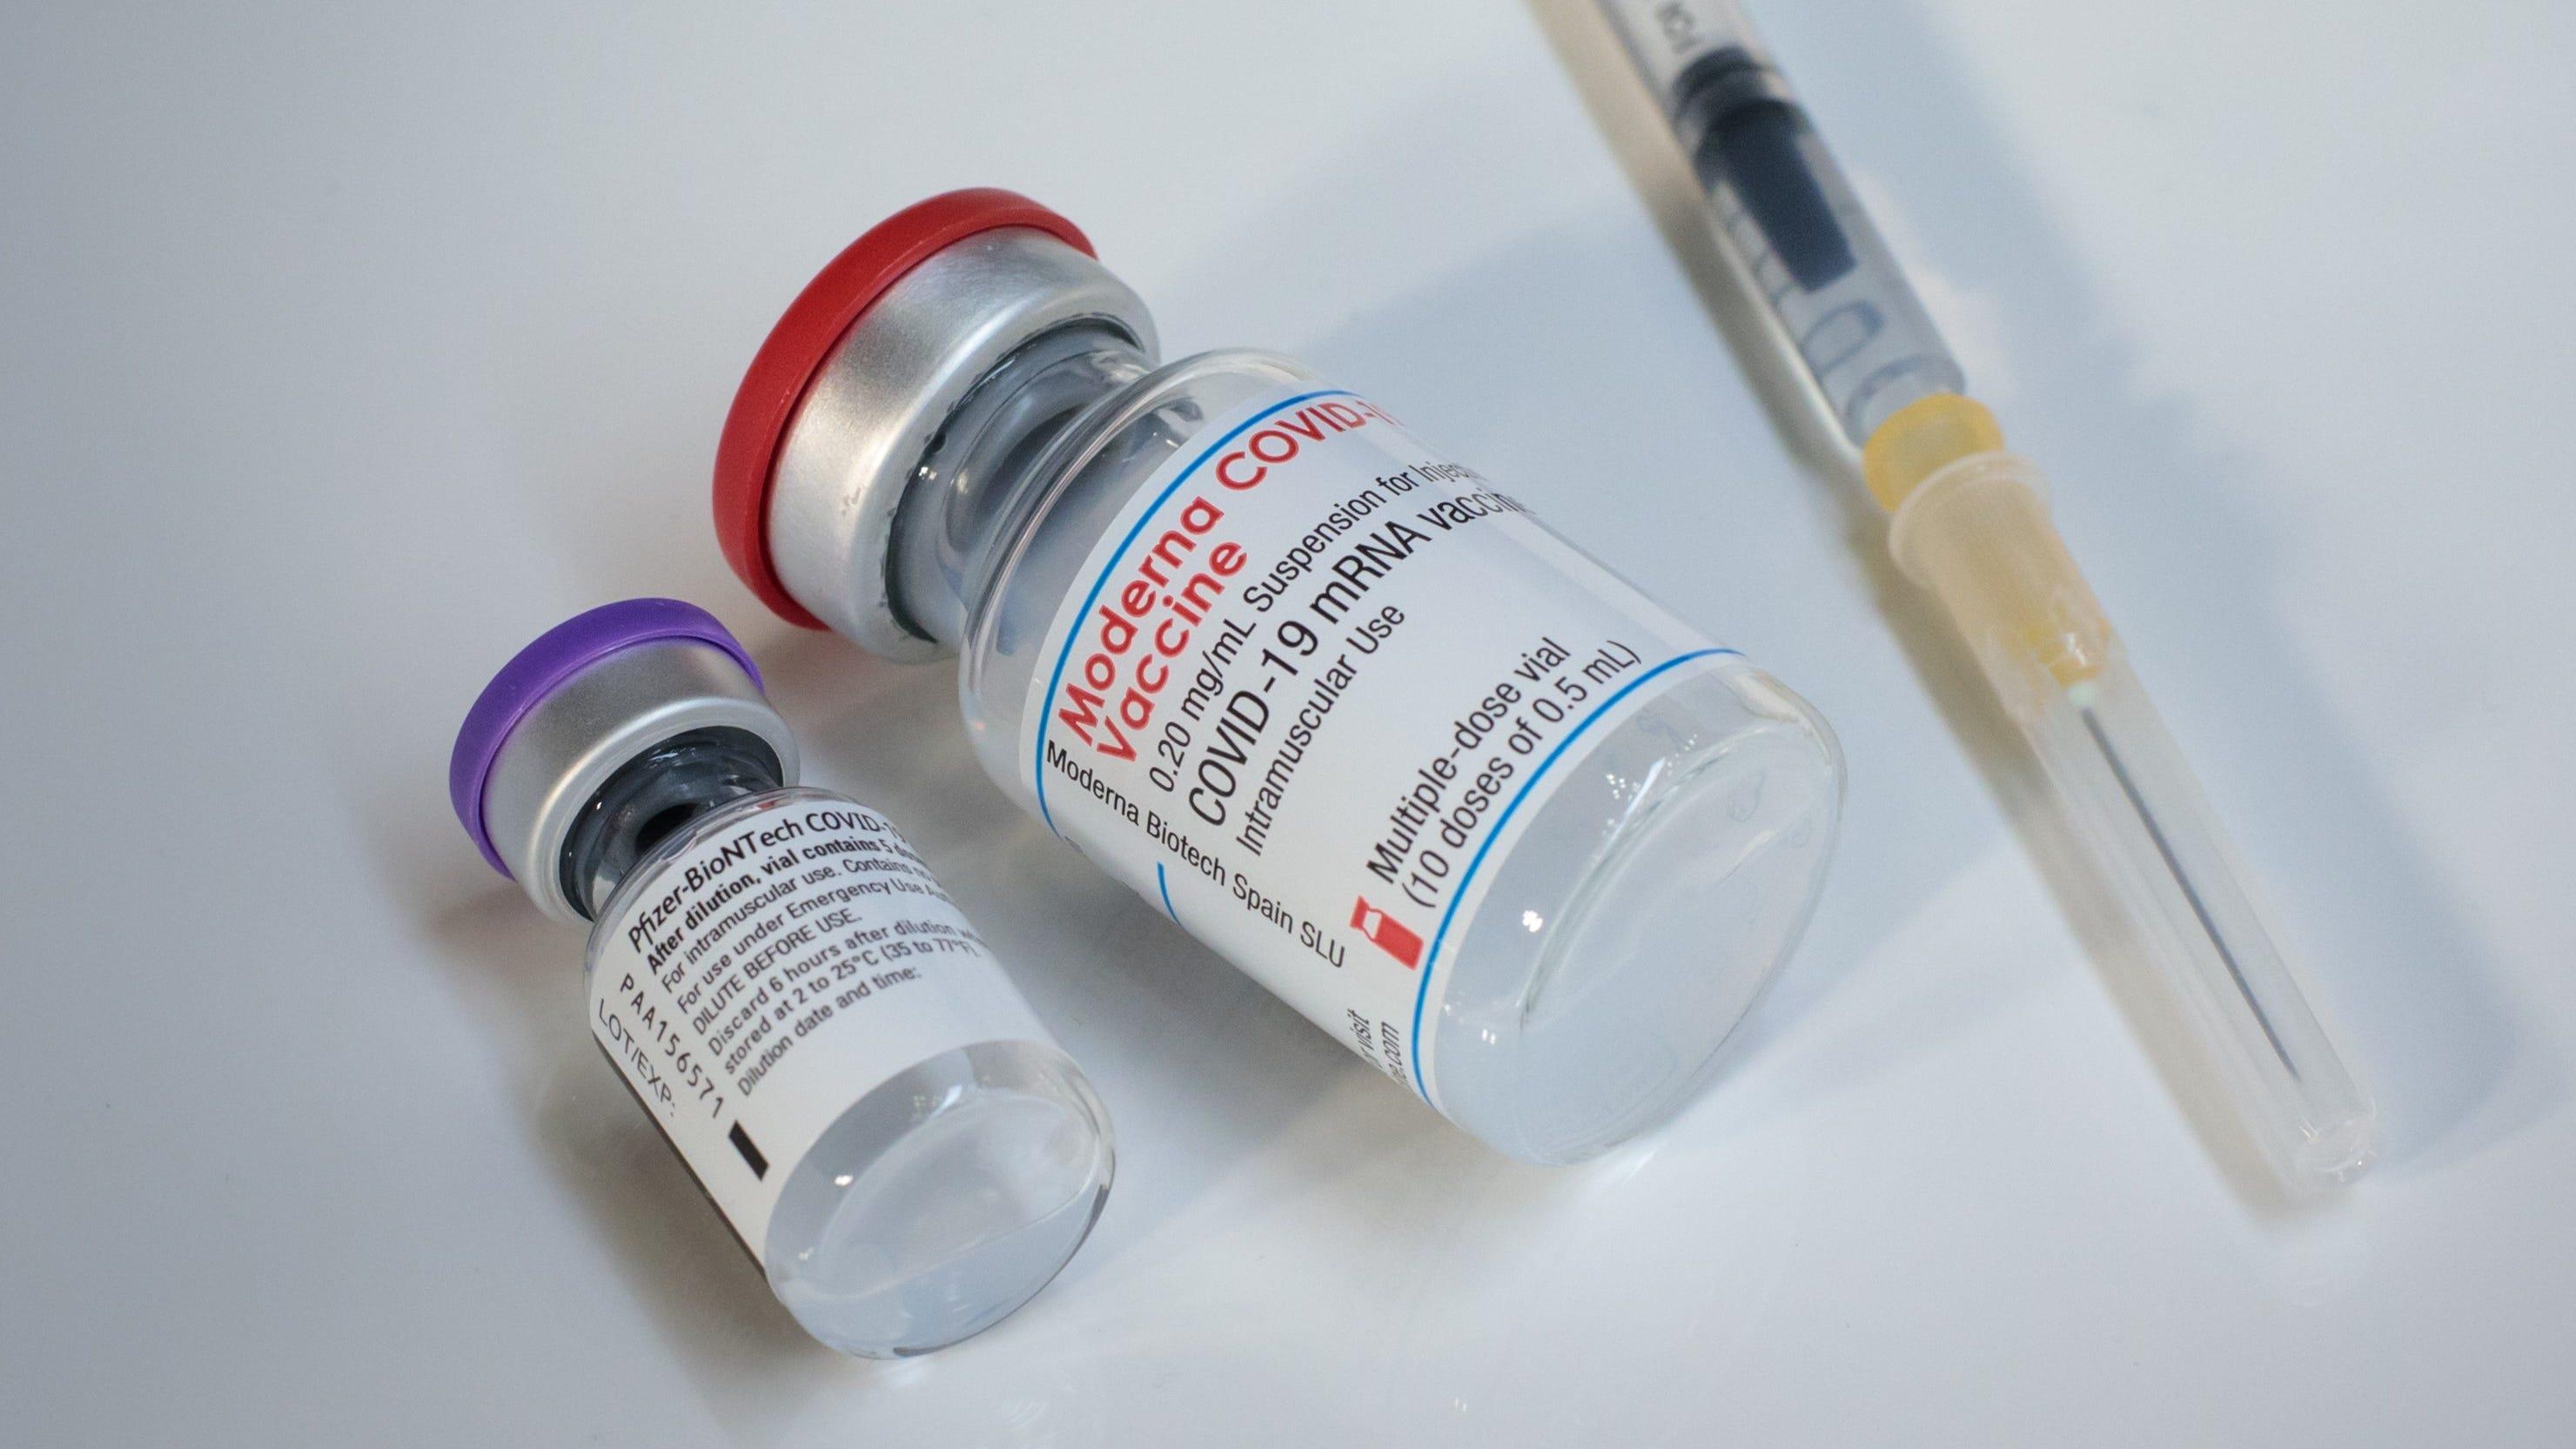 Moderna vaccine generates twice as many antibodies as Pfizer: study